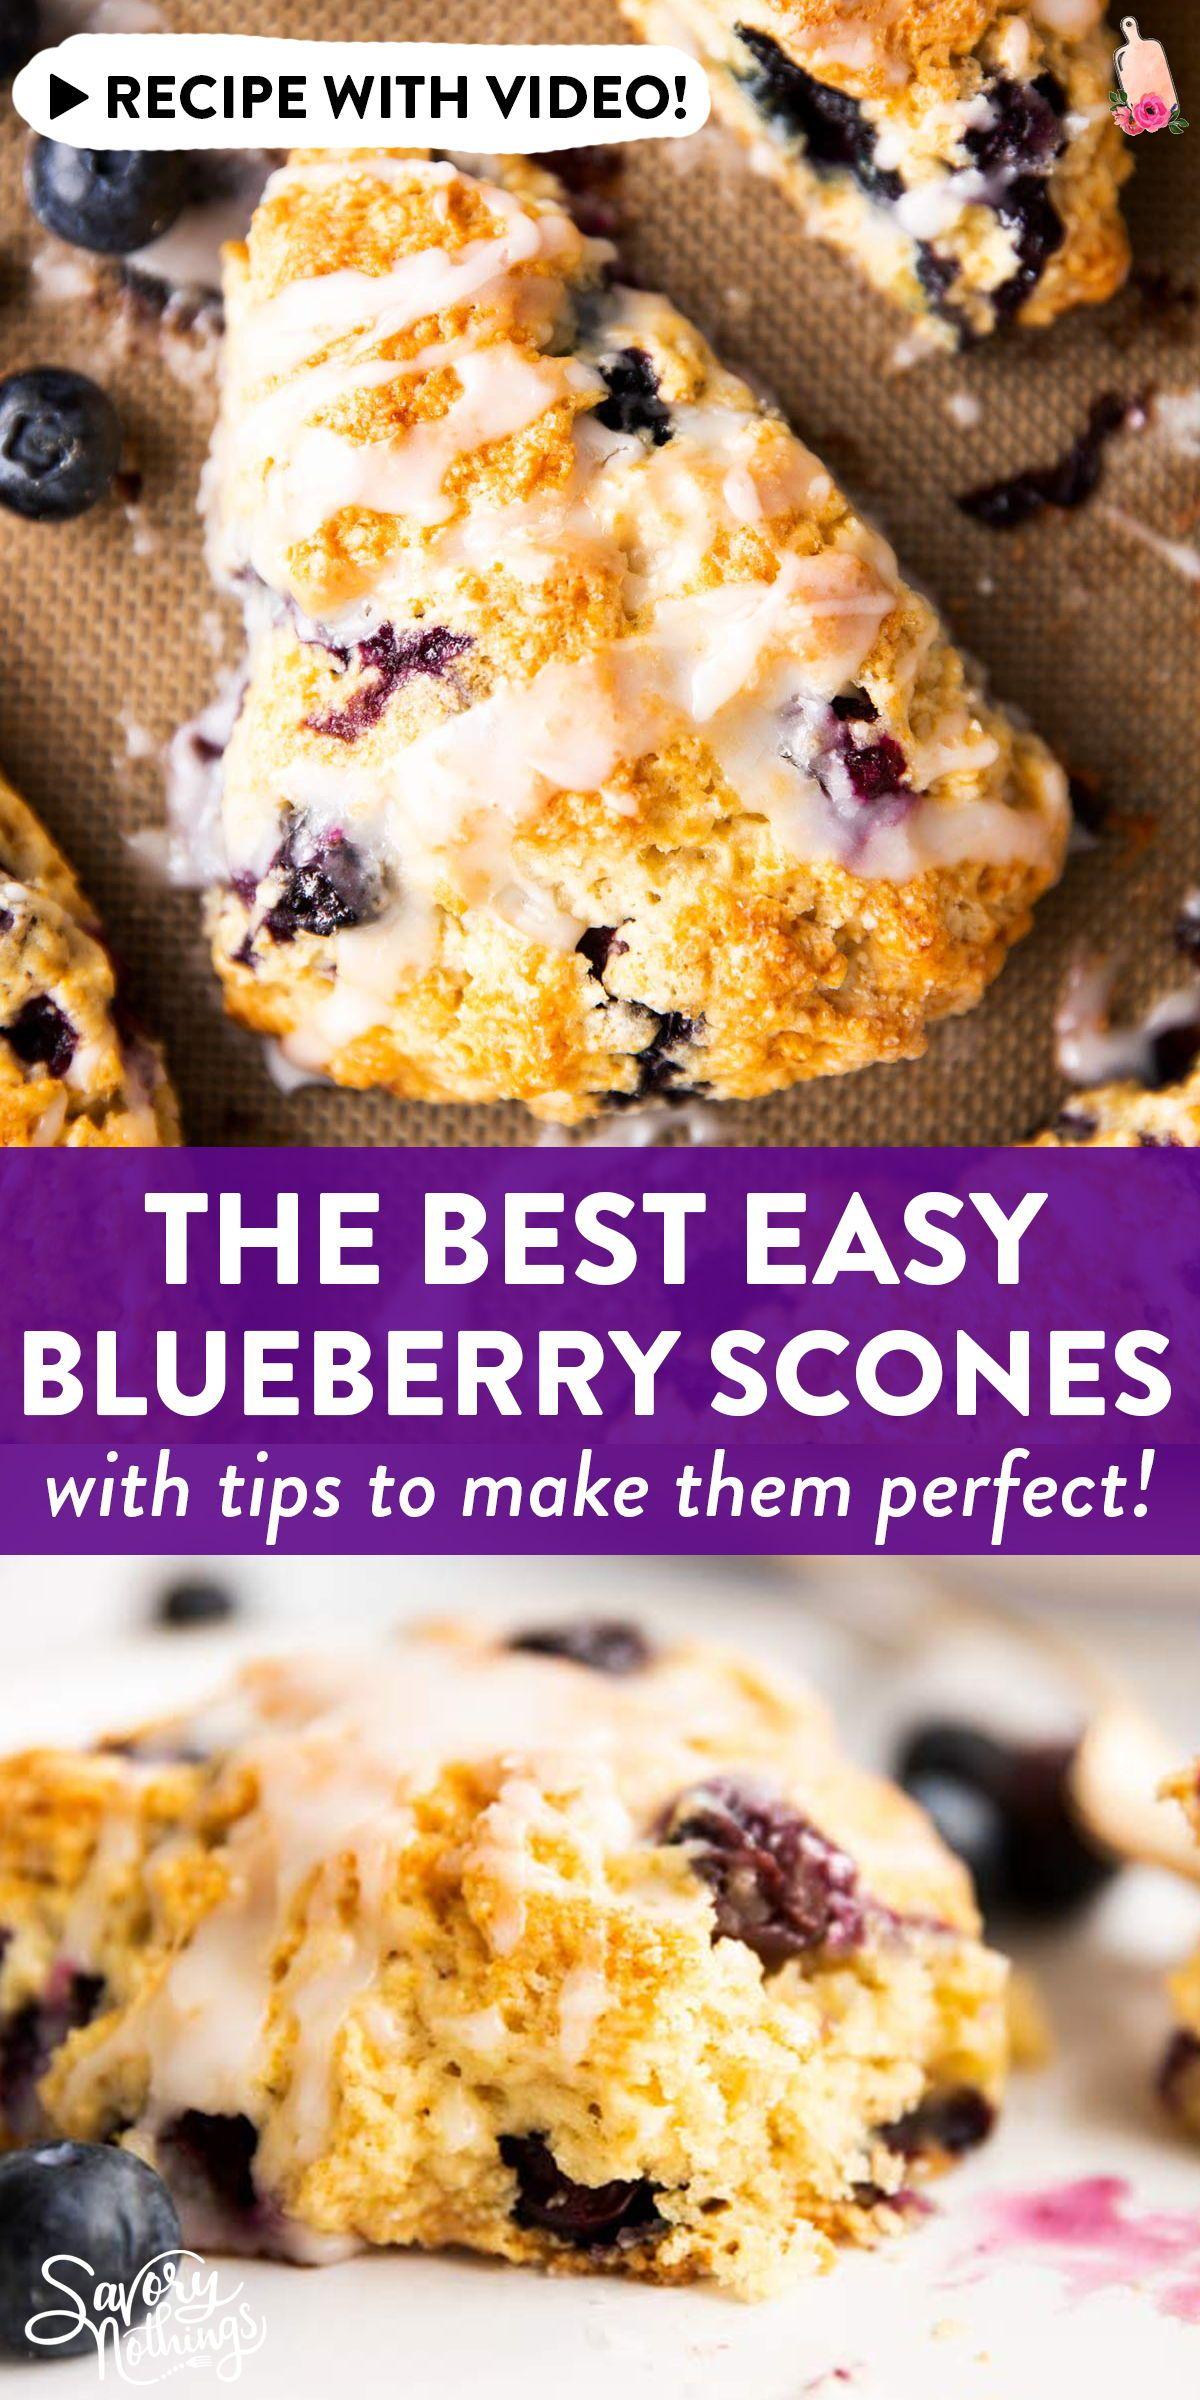 Buttermilk Blueberry Scones In 2020 Berries Recipes Blueberry Recipes Scones Recipe Easy